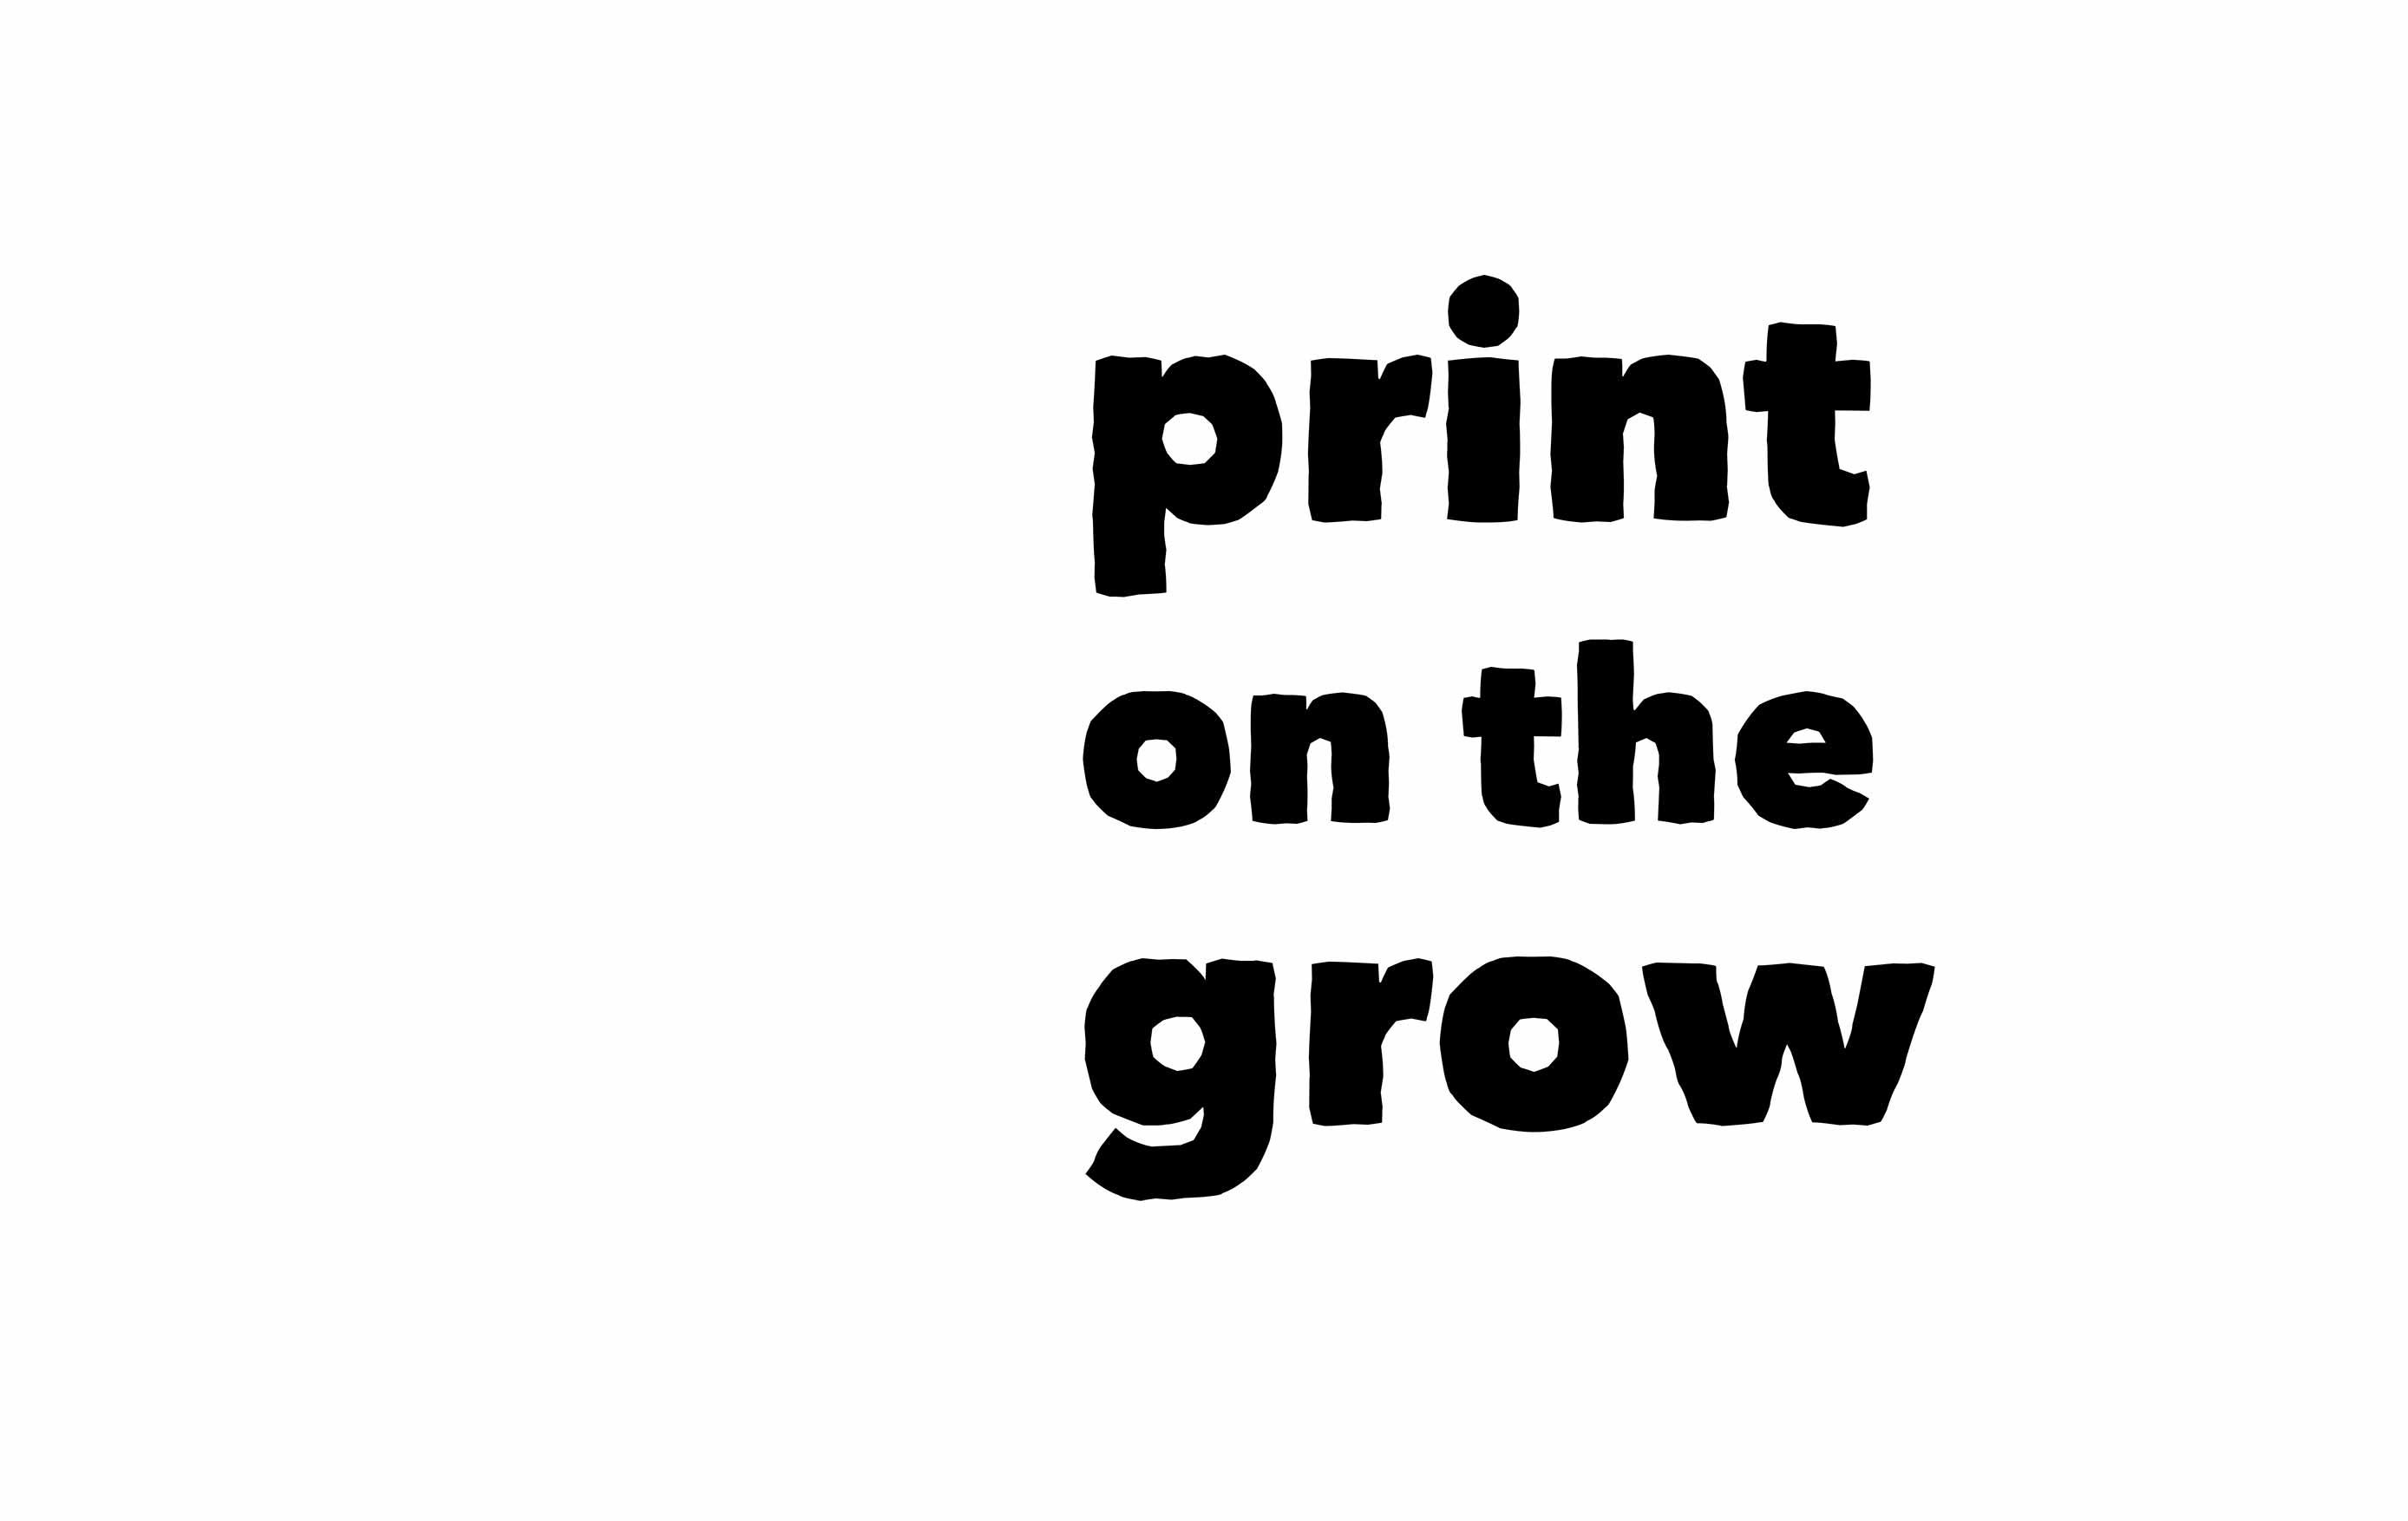 Presentation-3D-Growing-Alice-Wheeler-1